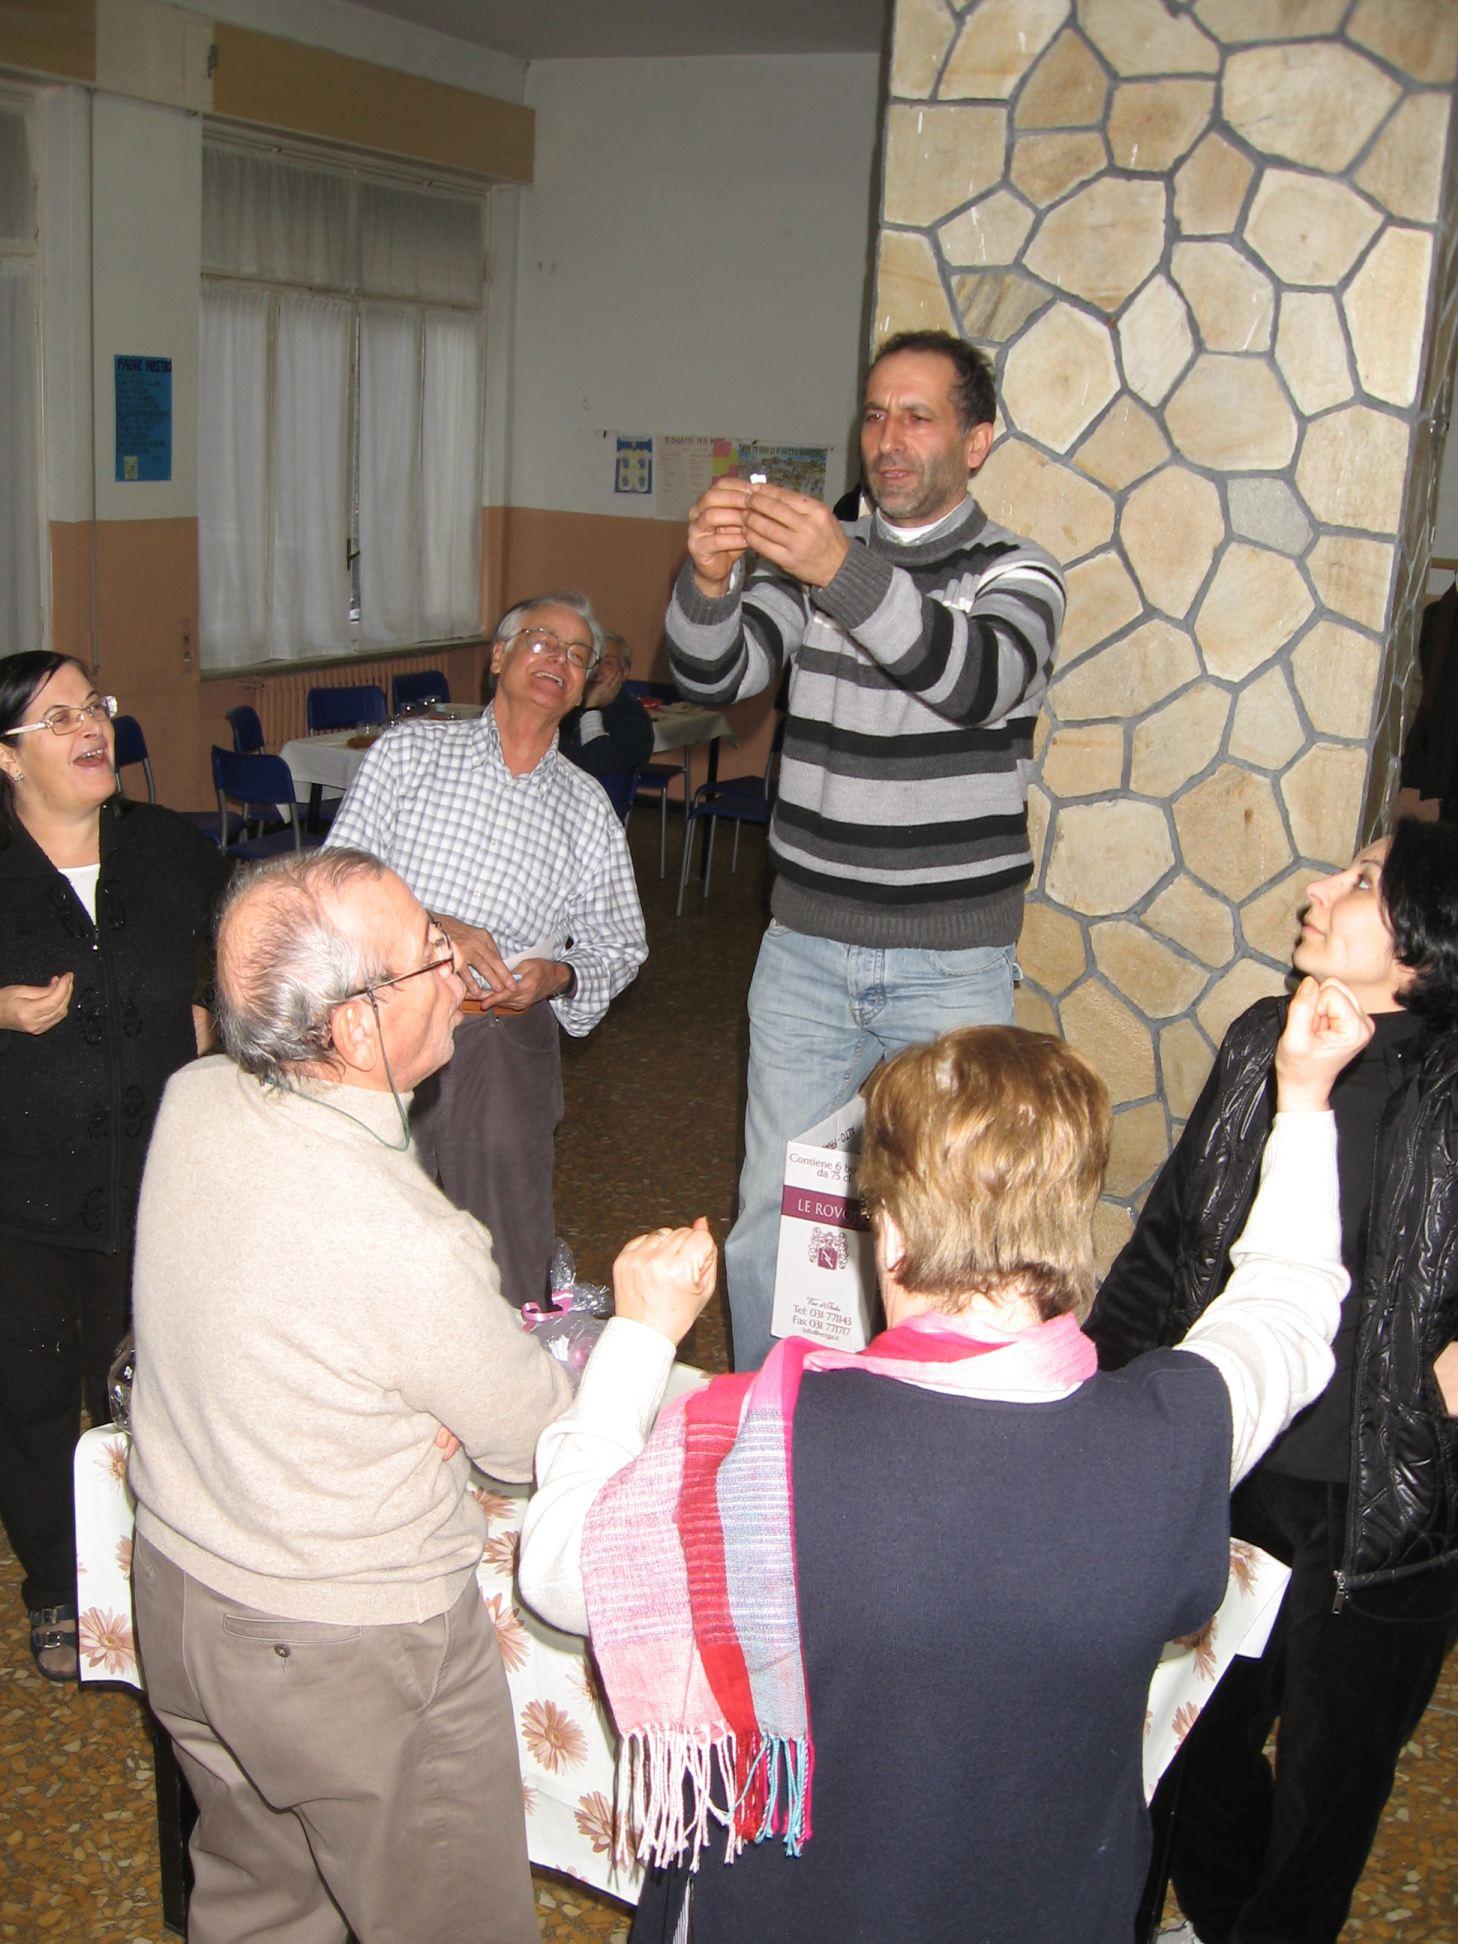 Pranzo_Comunitario-2009-12-19--14.49.10